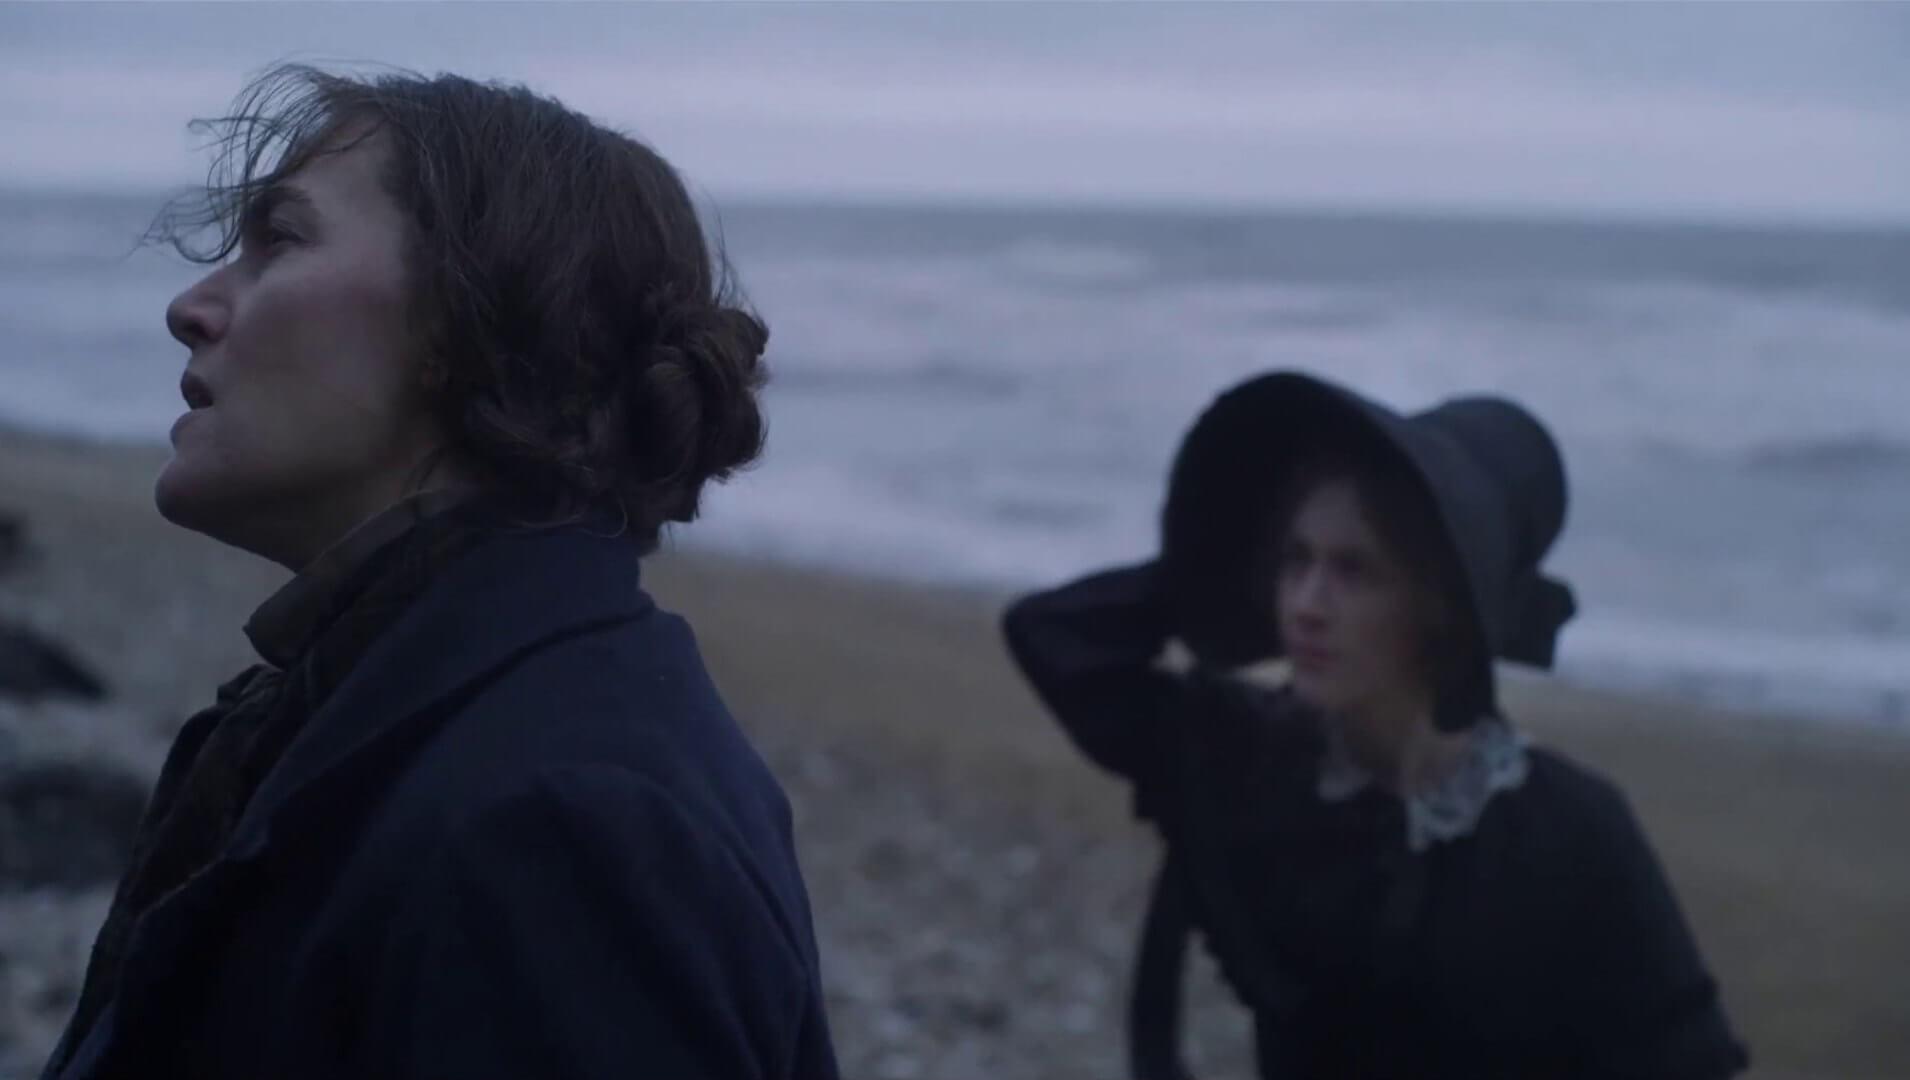 ammonite-movie-2020-kate-winslet-Saoirse-Ronan